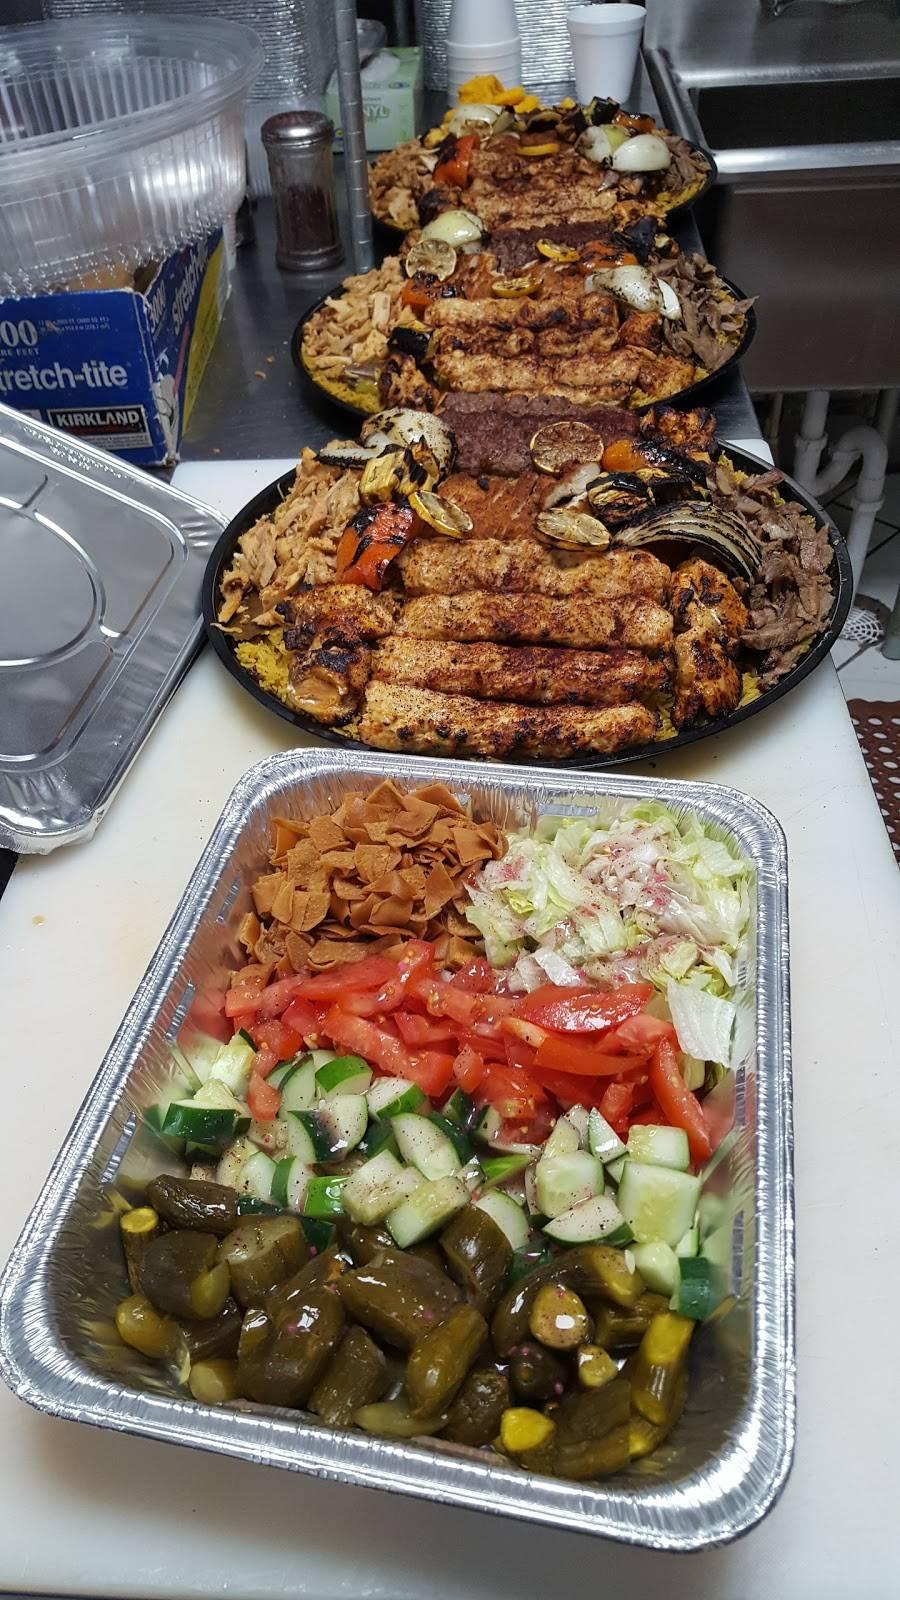 Babylon | meal takeaway | 1435 S Main St, Harrisonburg, VA 22801, USA | 5406383950 OR +1 540-638-3950